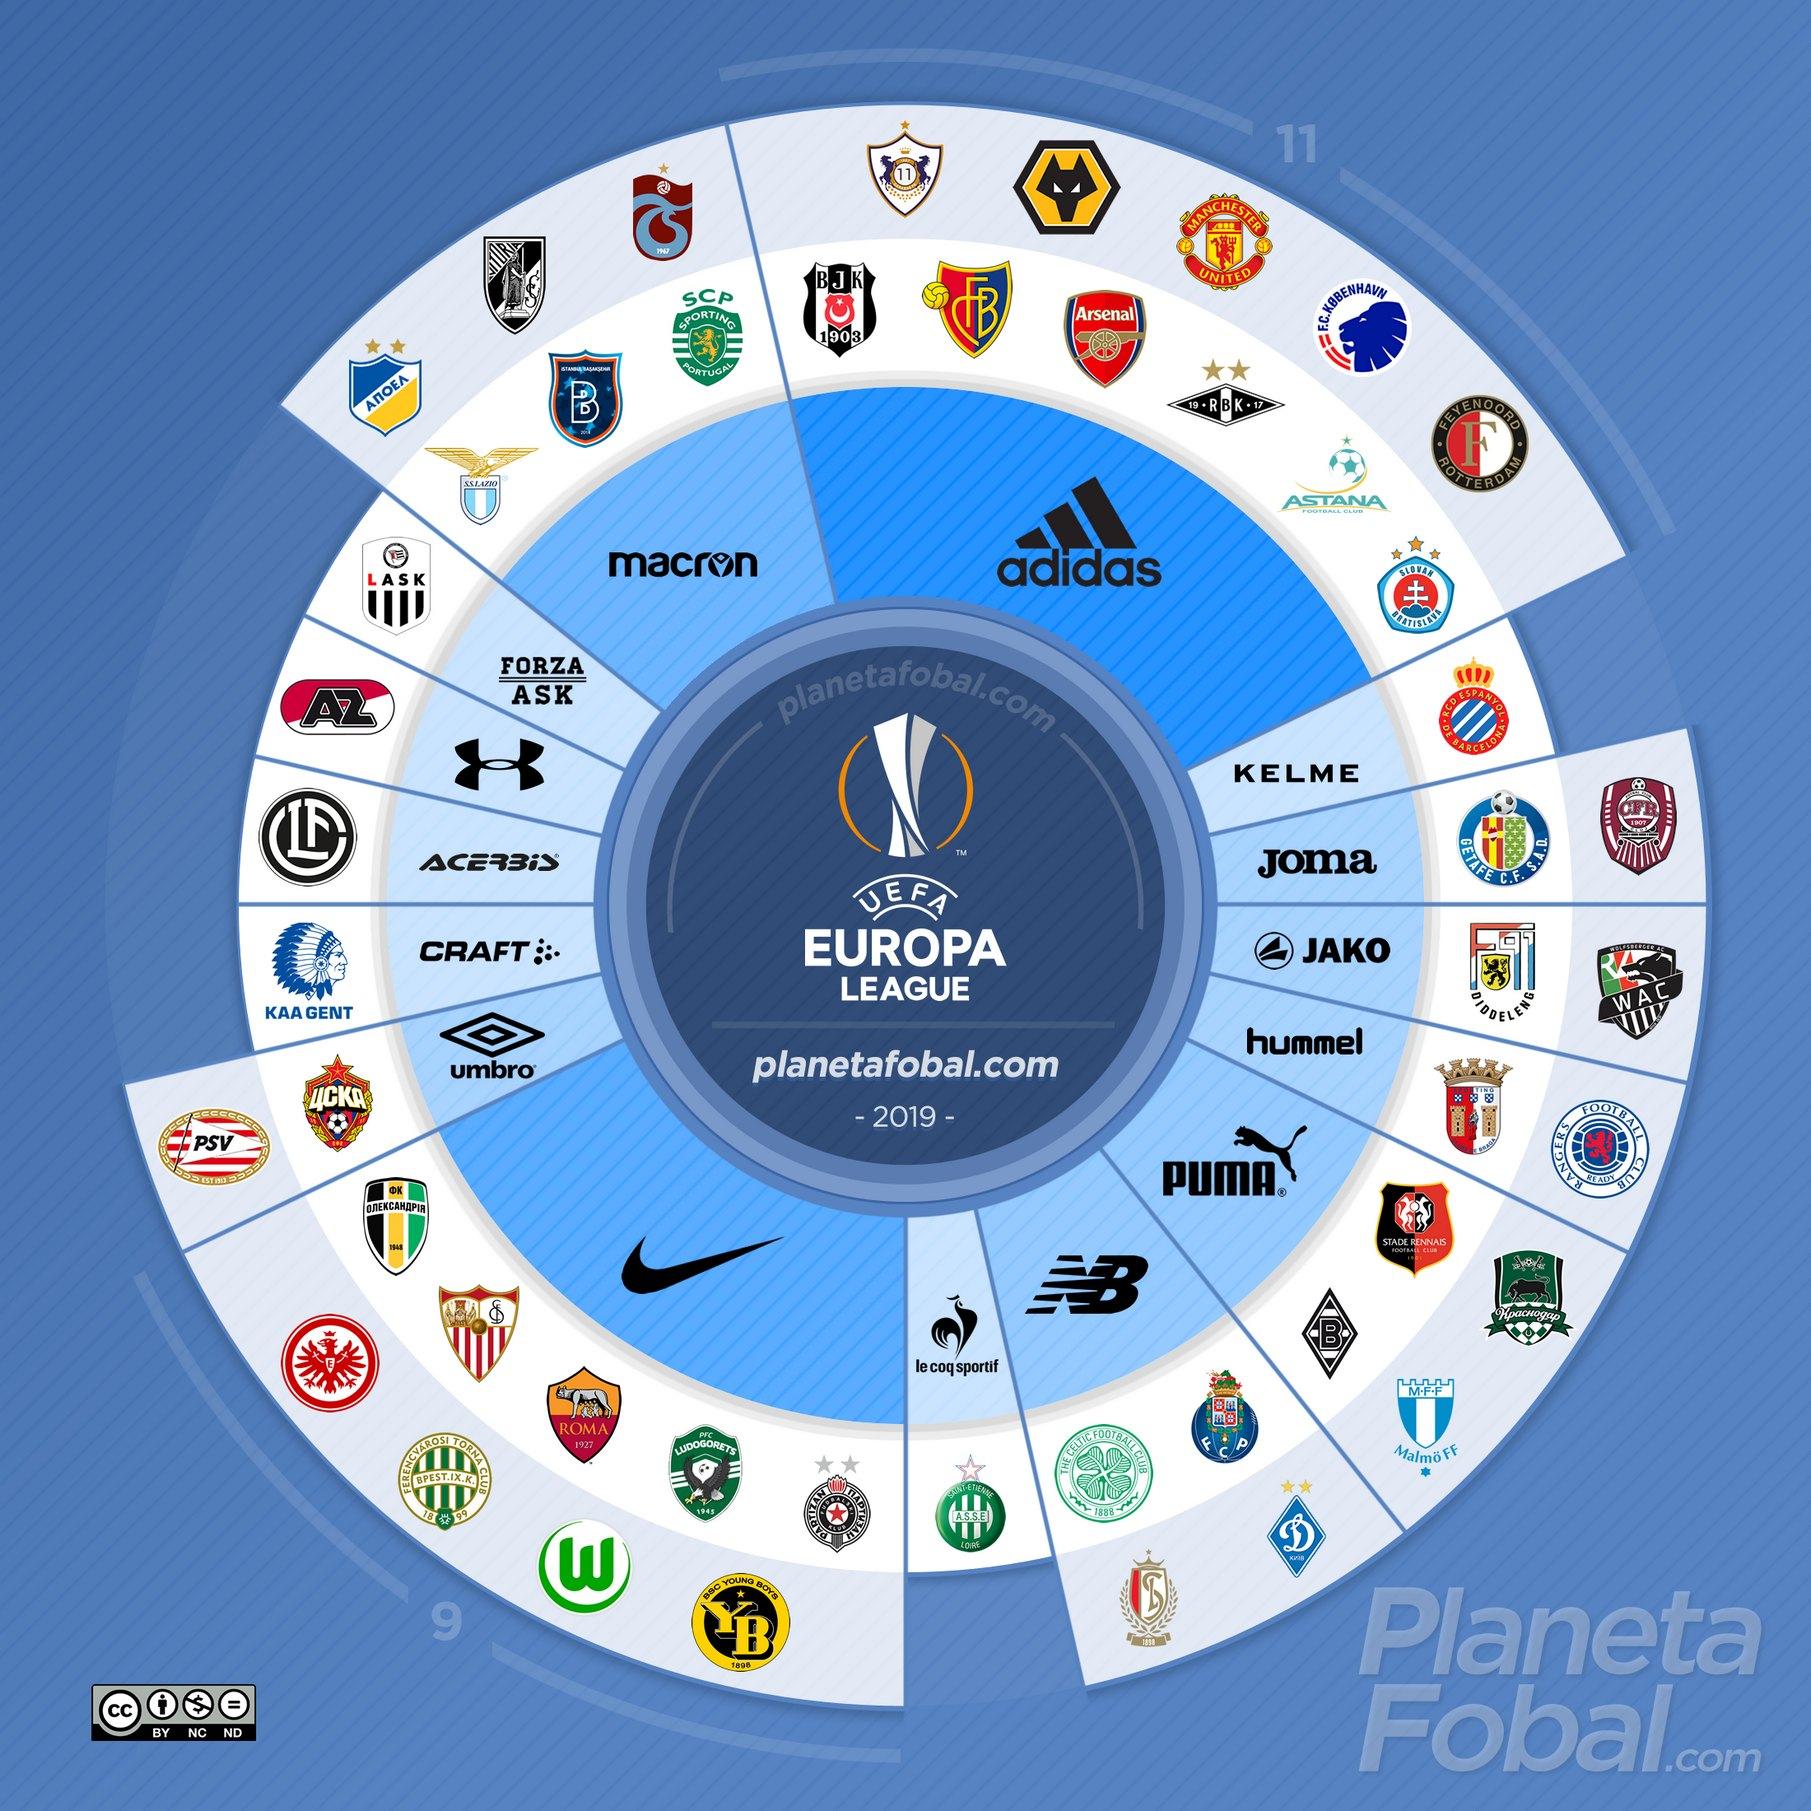 Marcas deportivas de la UEFA Europa League 2019/2020 | @planetafobal